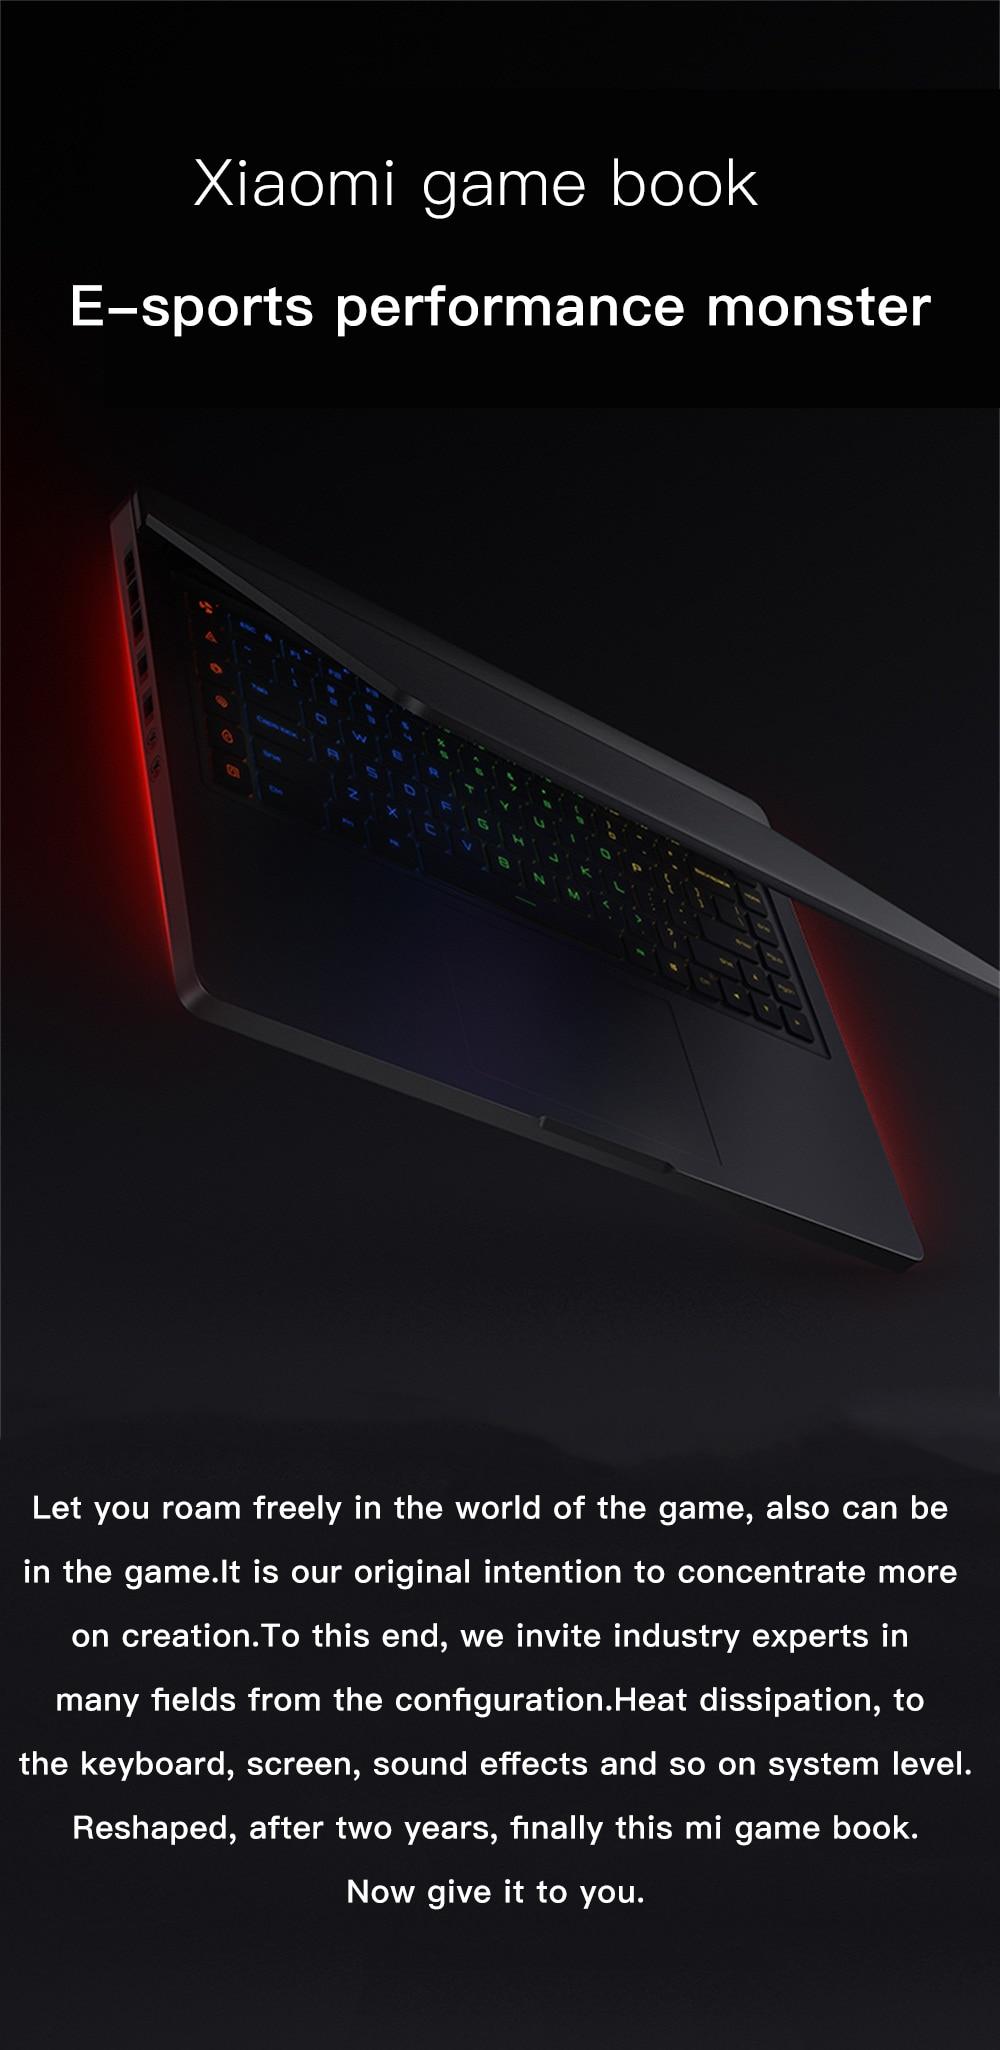 Xiaomi Mi Gaming Notebook 15.6 Intel Core 8G+1258G/16G 256GB Windows 10 Quad-core NVIDIA GeForce GTX 1060 I7-7700HQ 4